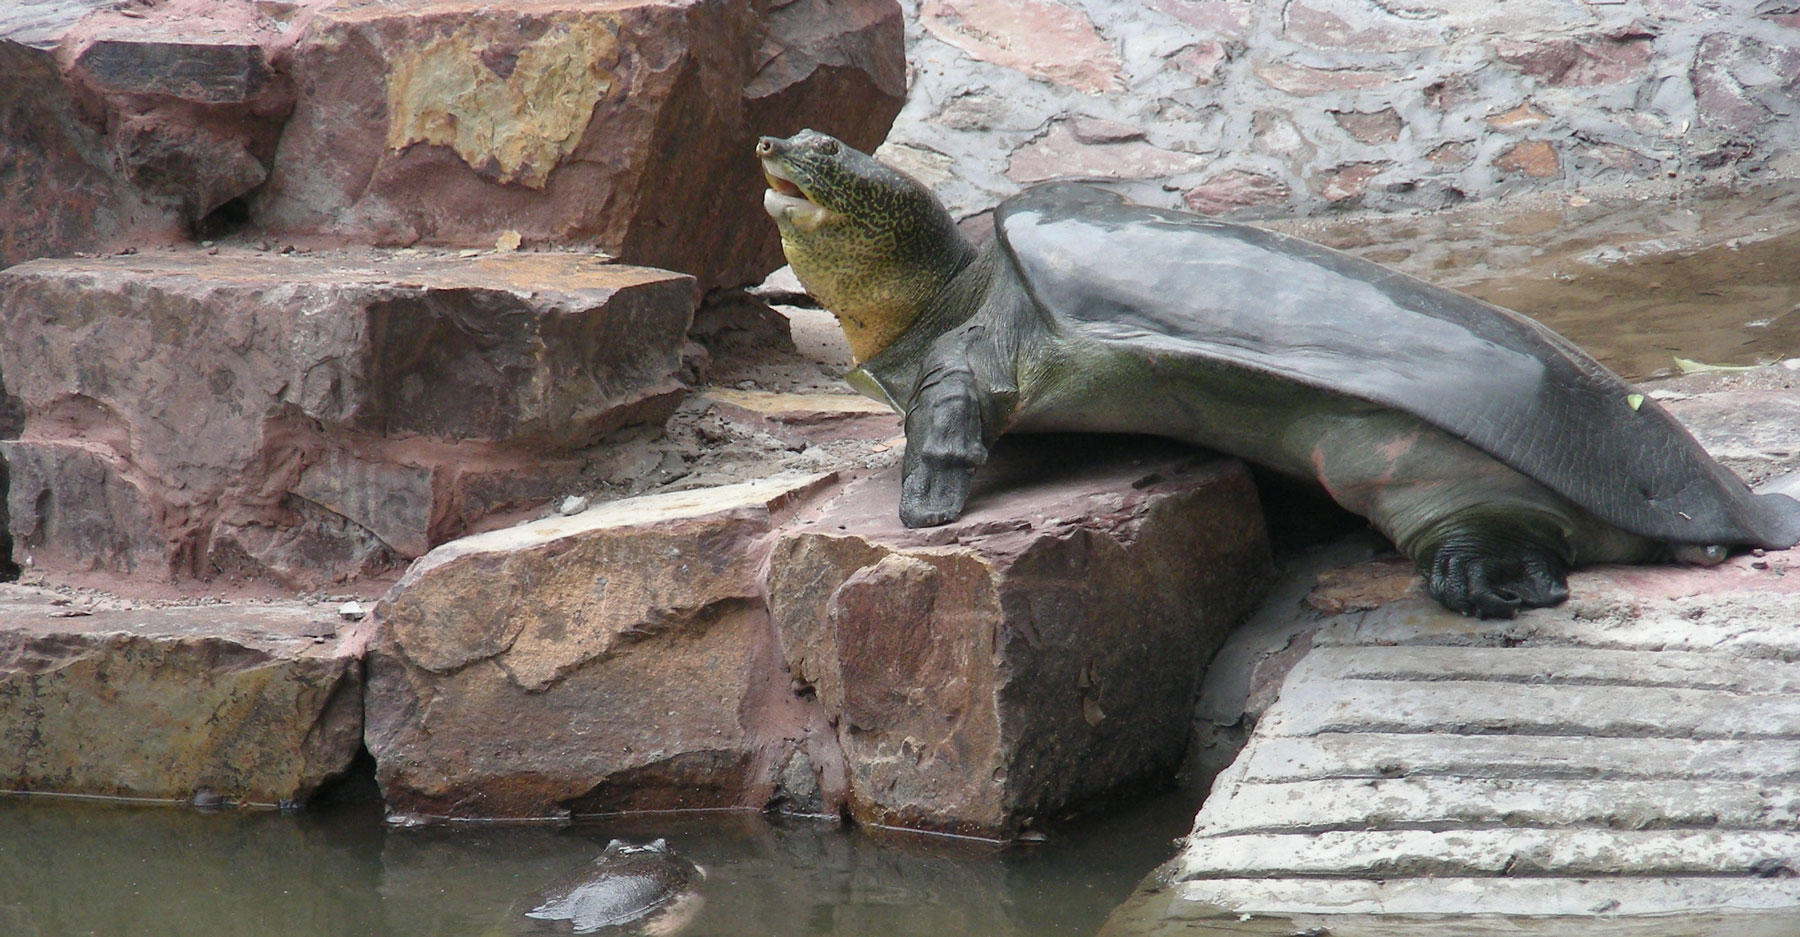 Yangtze giant softshell turtle (Rafetus swinhoei)